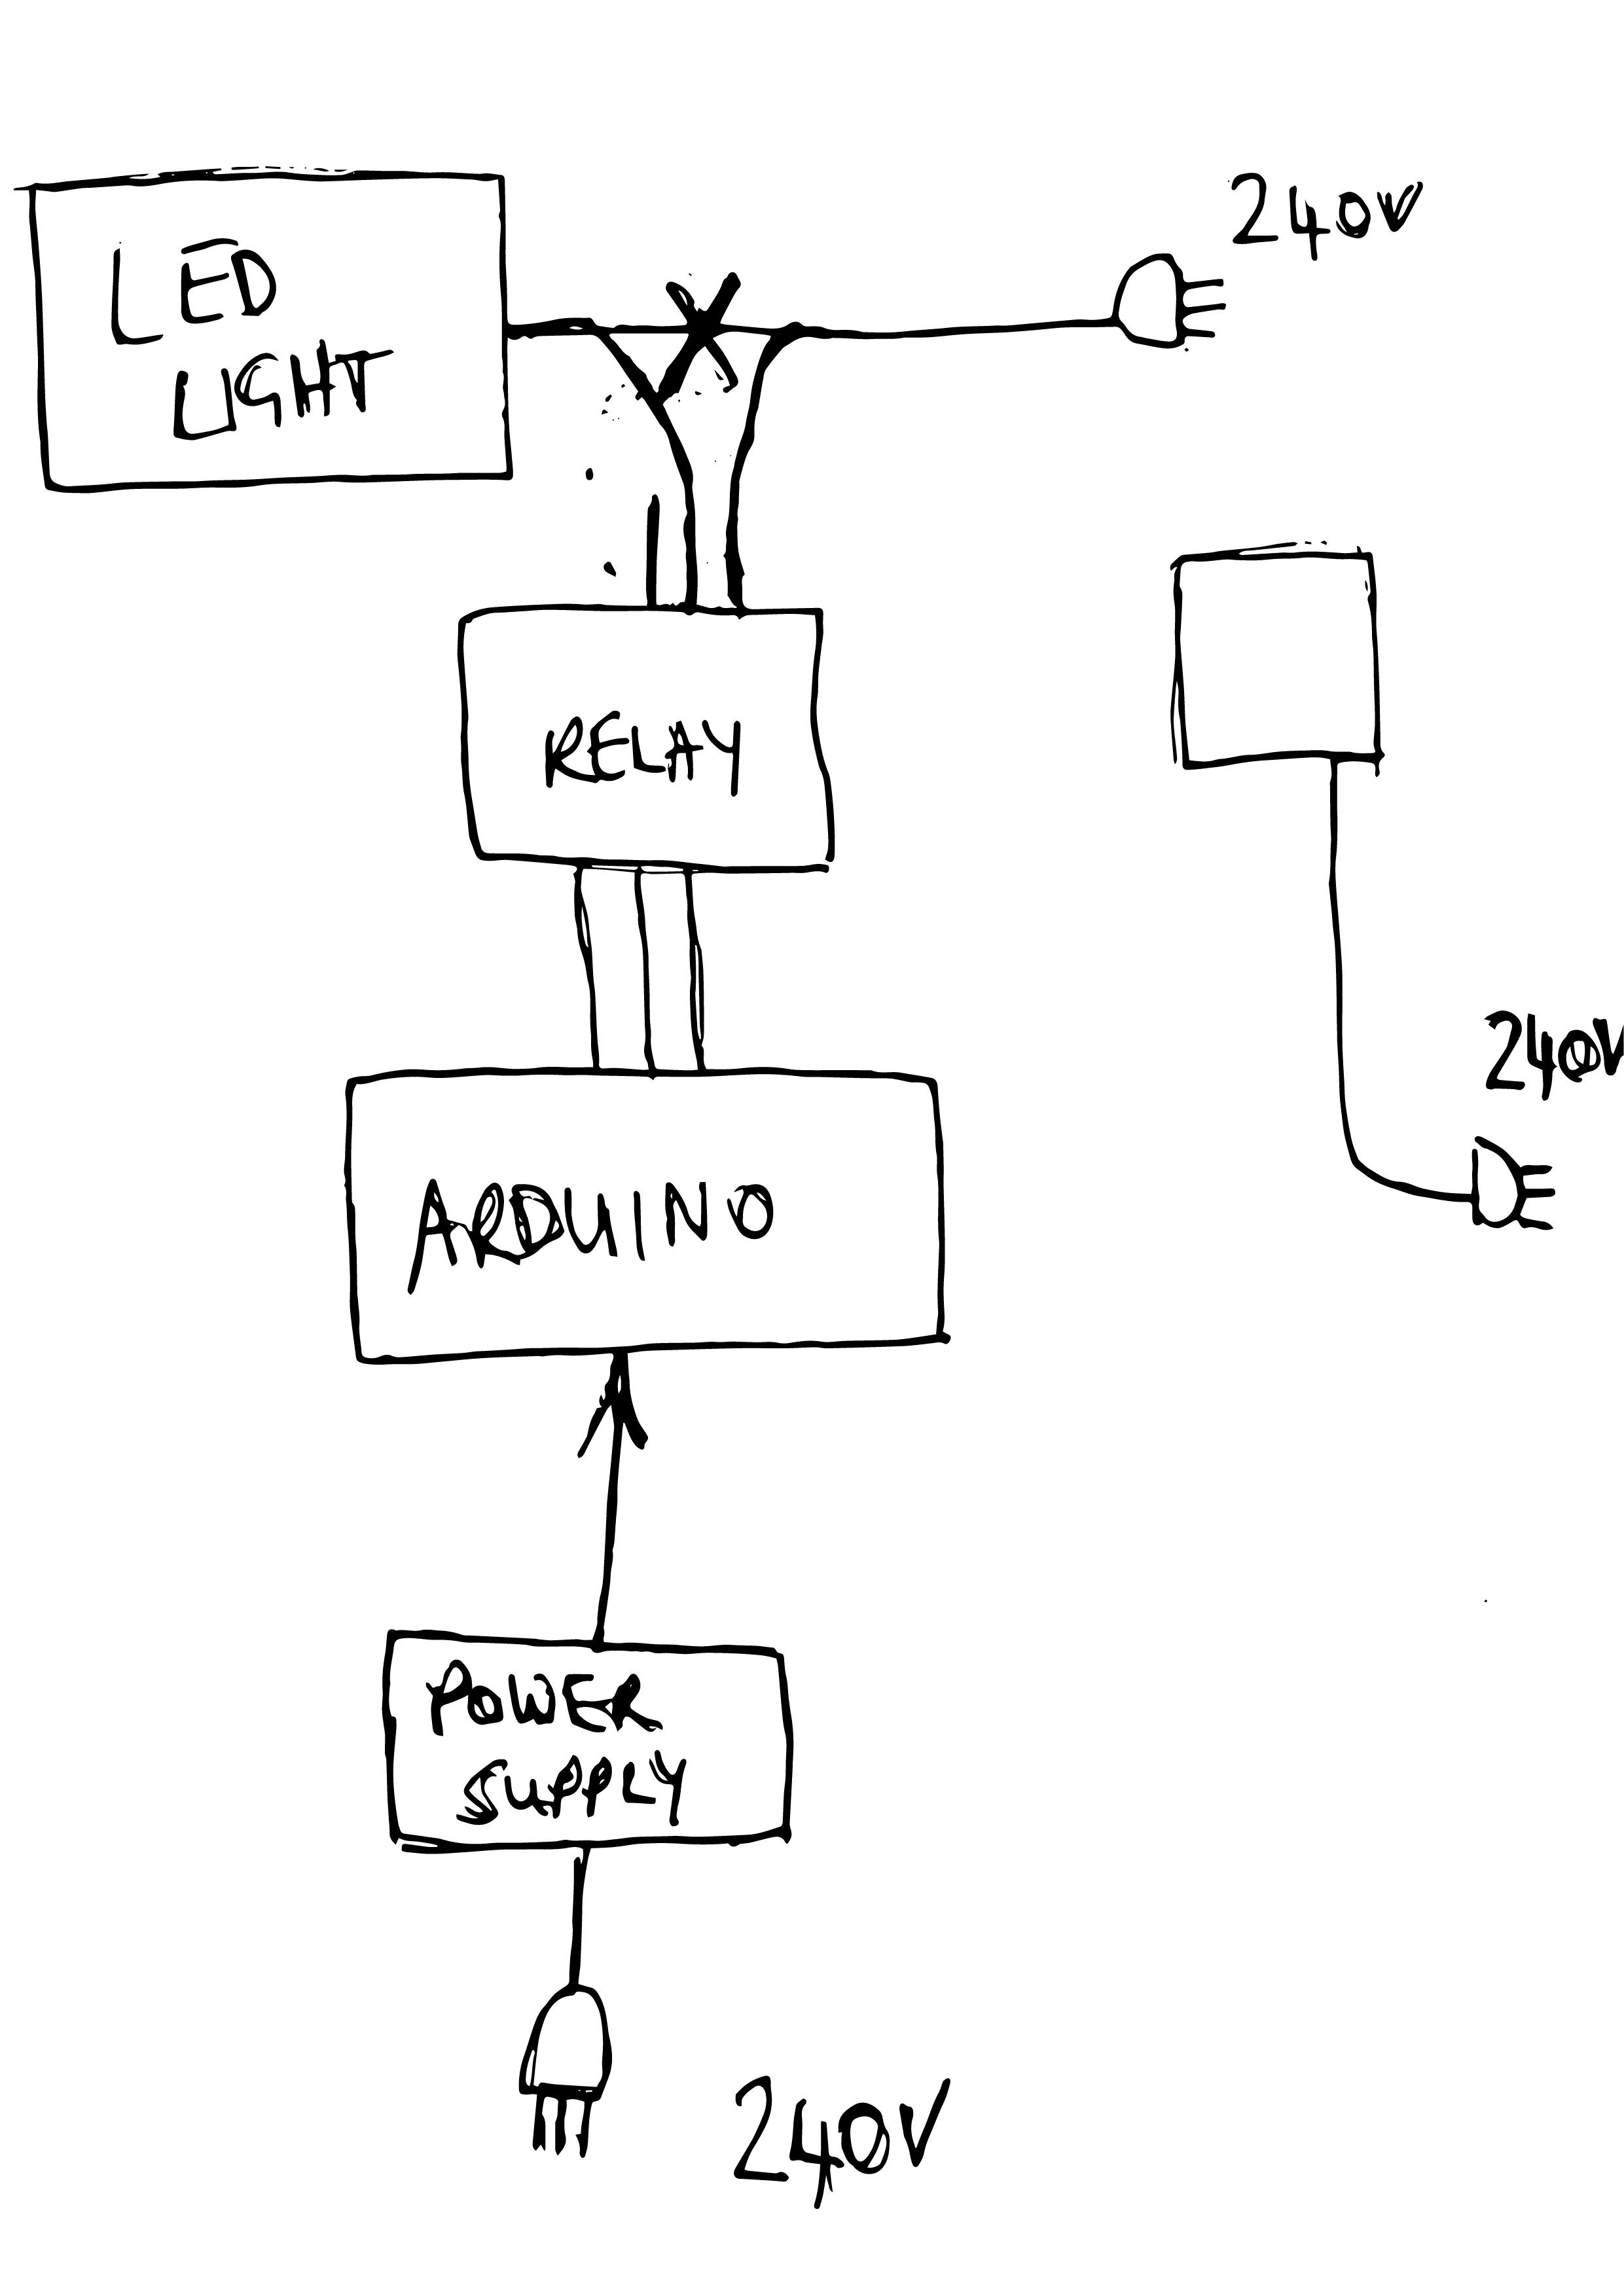 ARGUINO AND LED ELECTRICS DIAGRAM